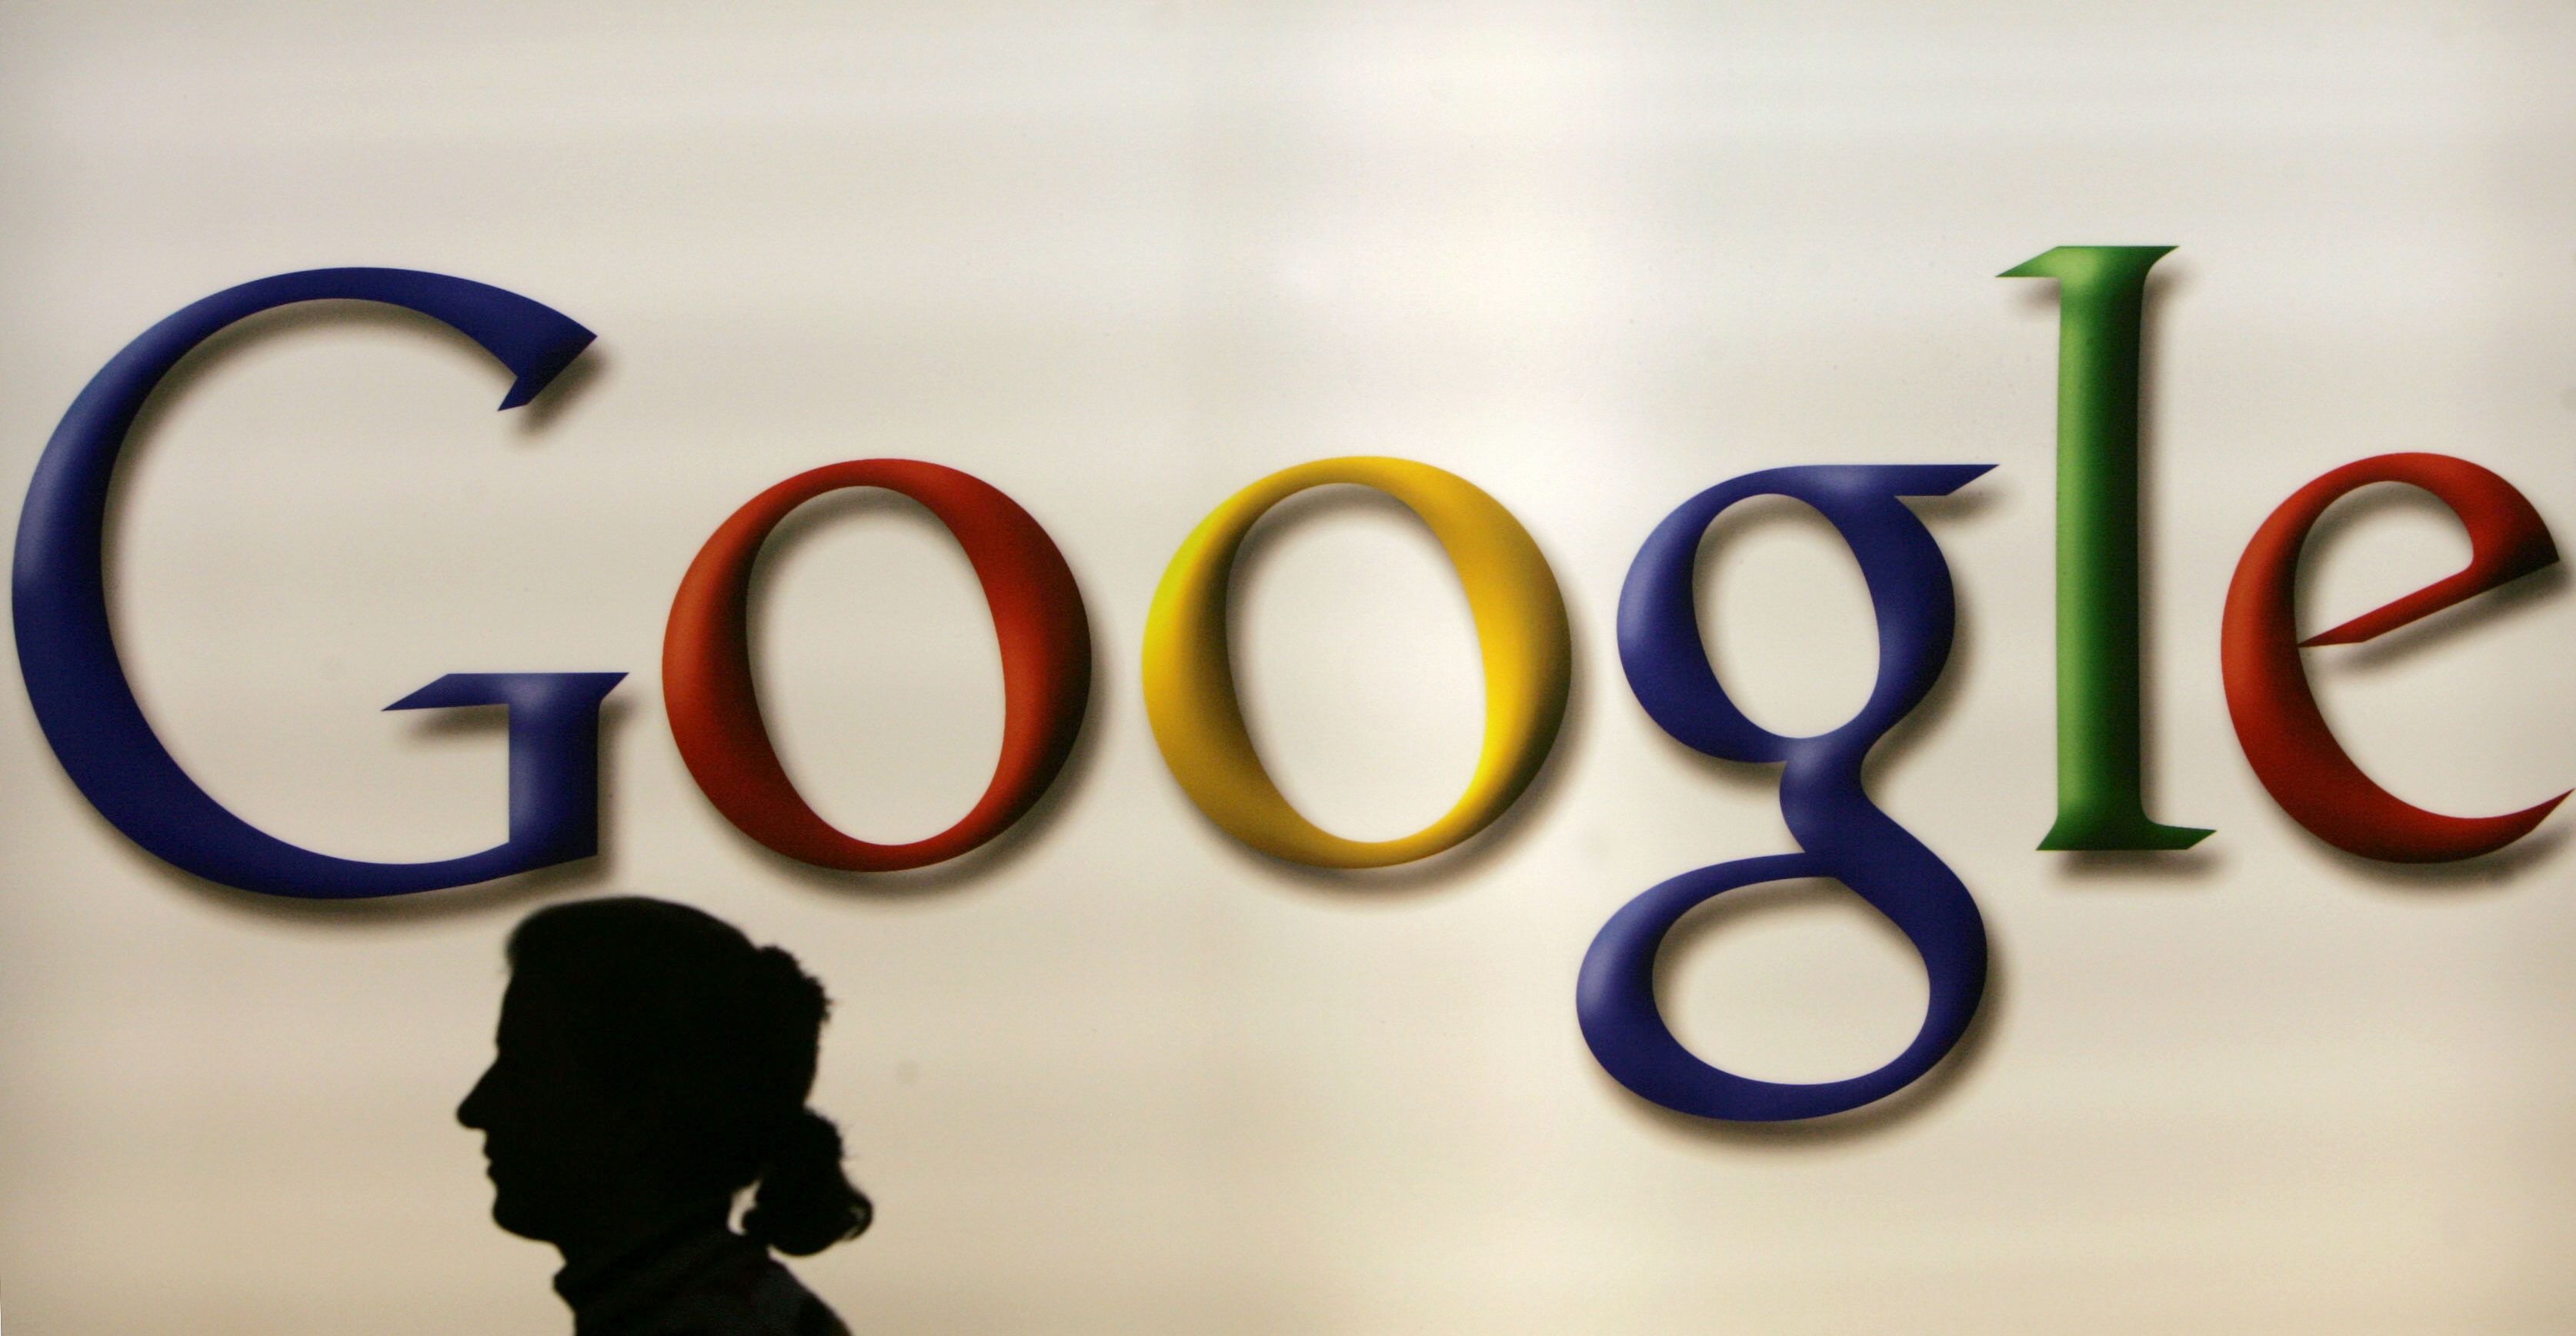 Google logo generic